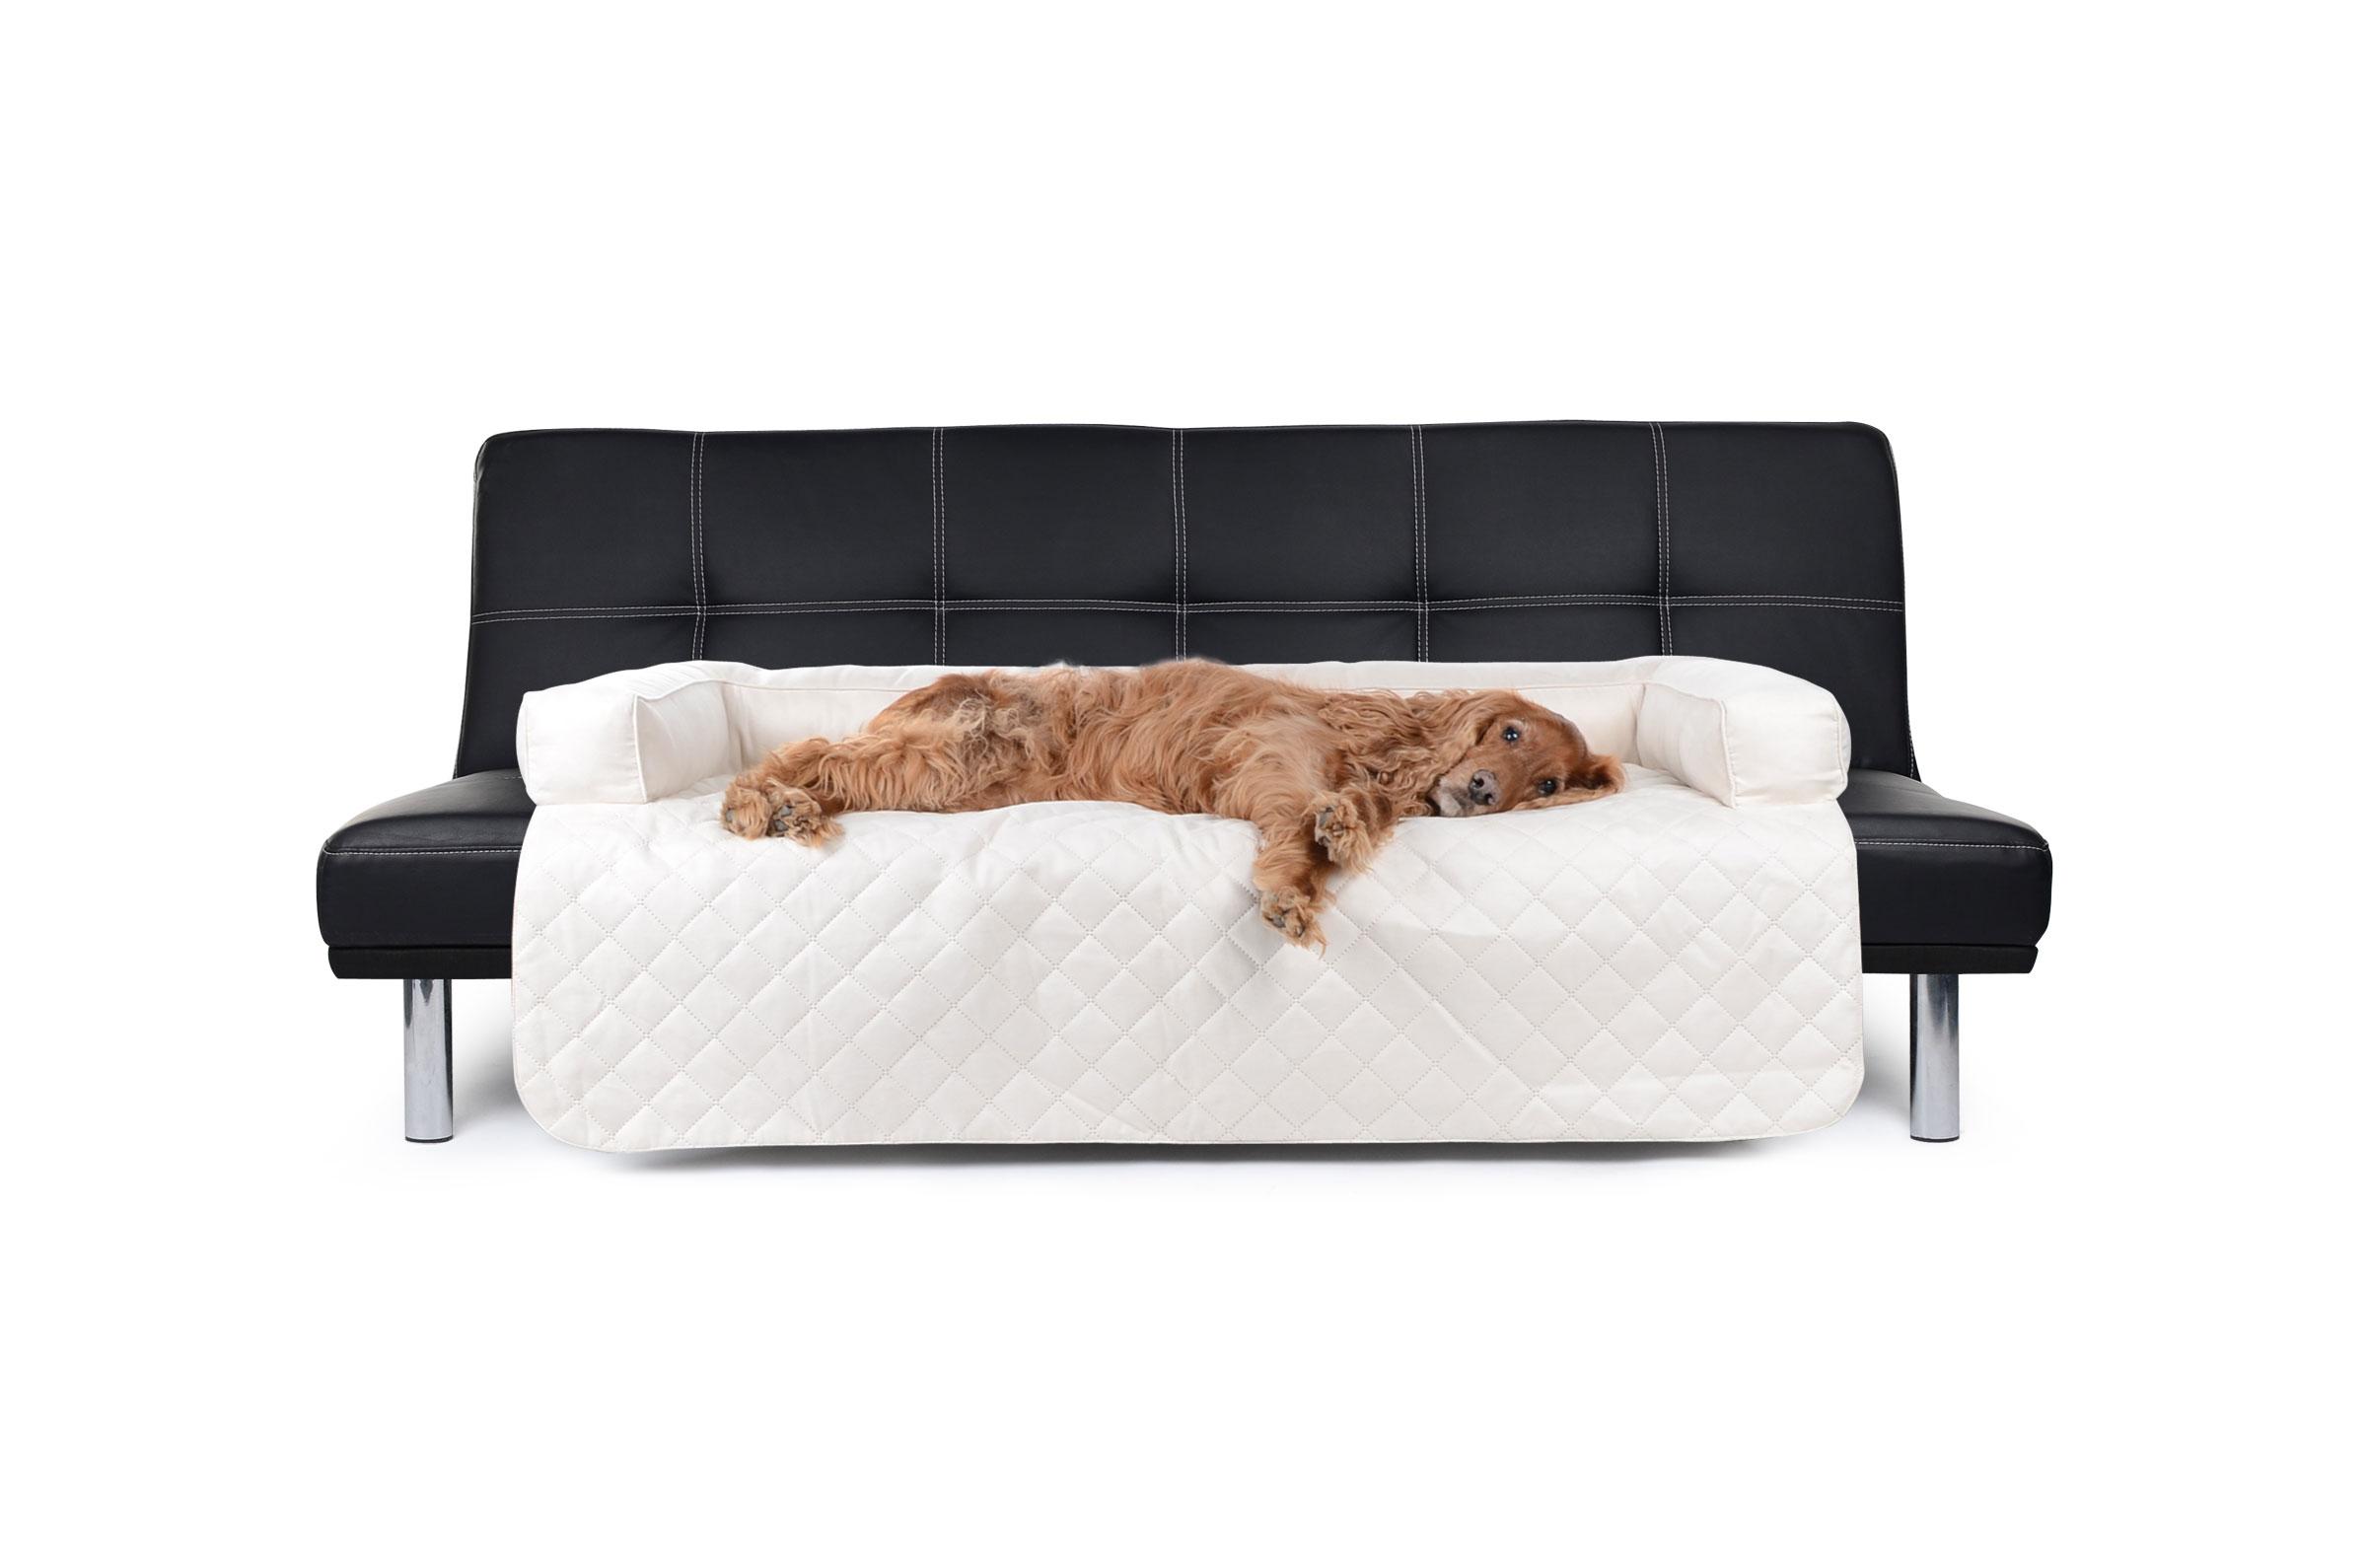 tiervital naturprodukte hunde sofaschutzdecke. Black Bedroom Furniture Sets. Home Design Ideas